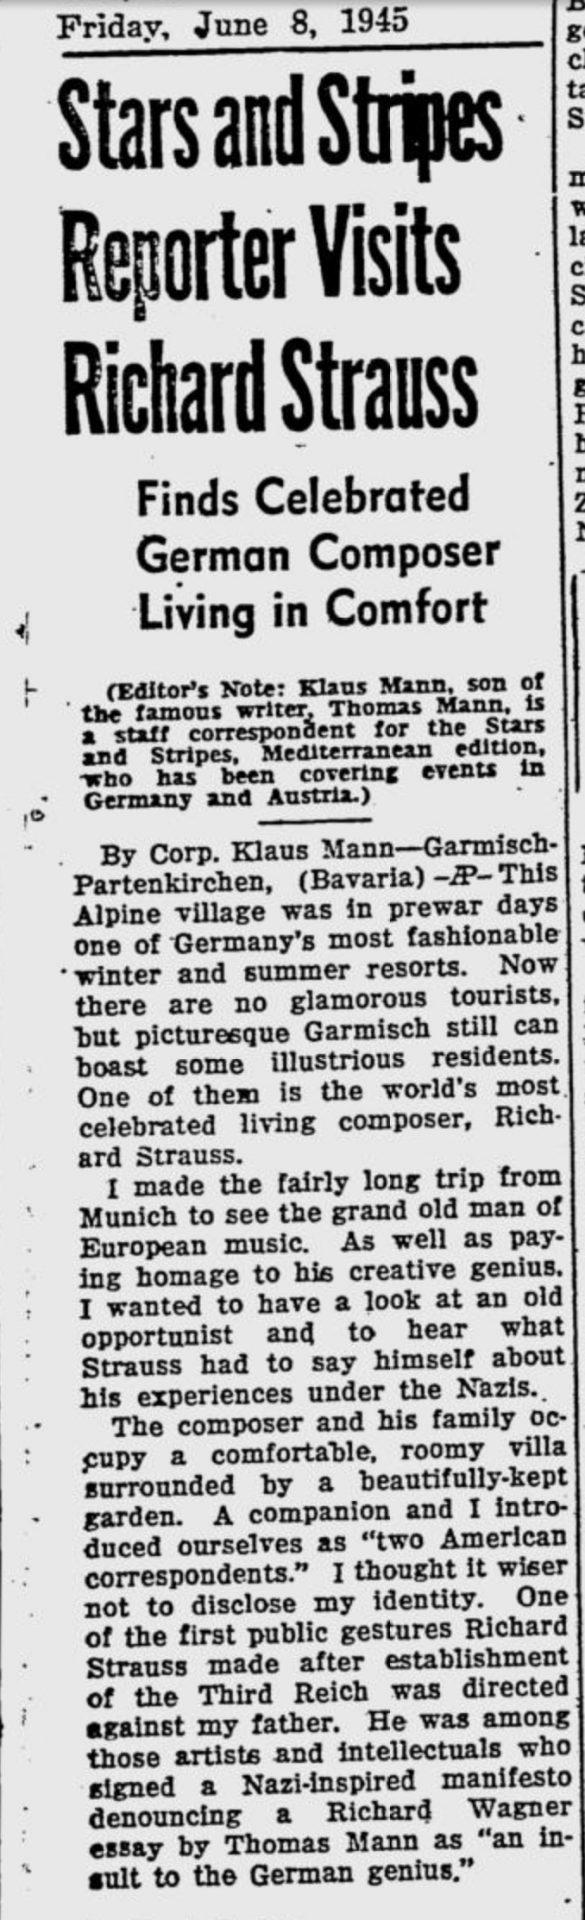 Klaus Mann on Richard Strauss, 1945